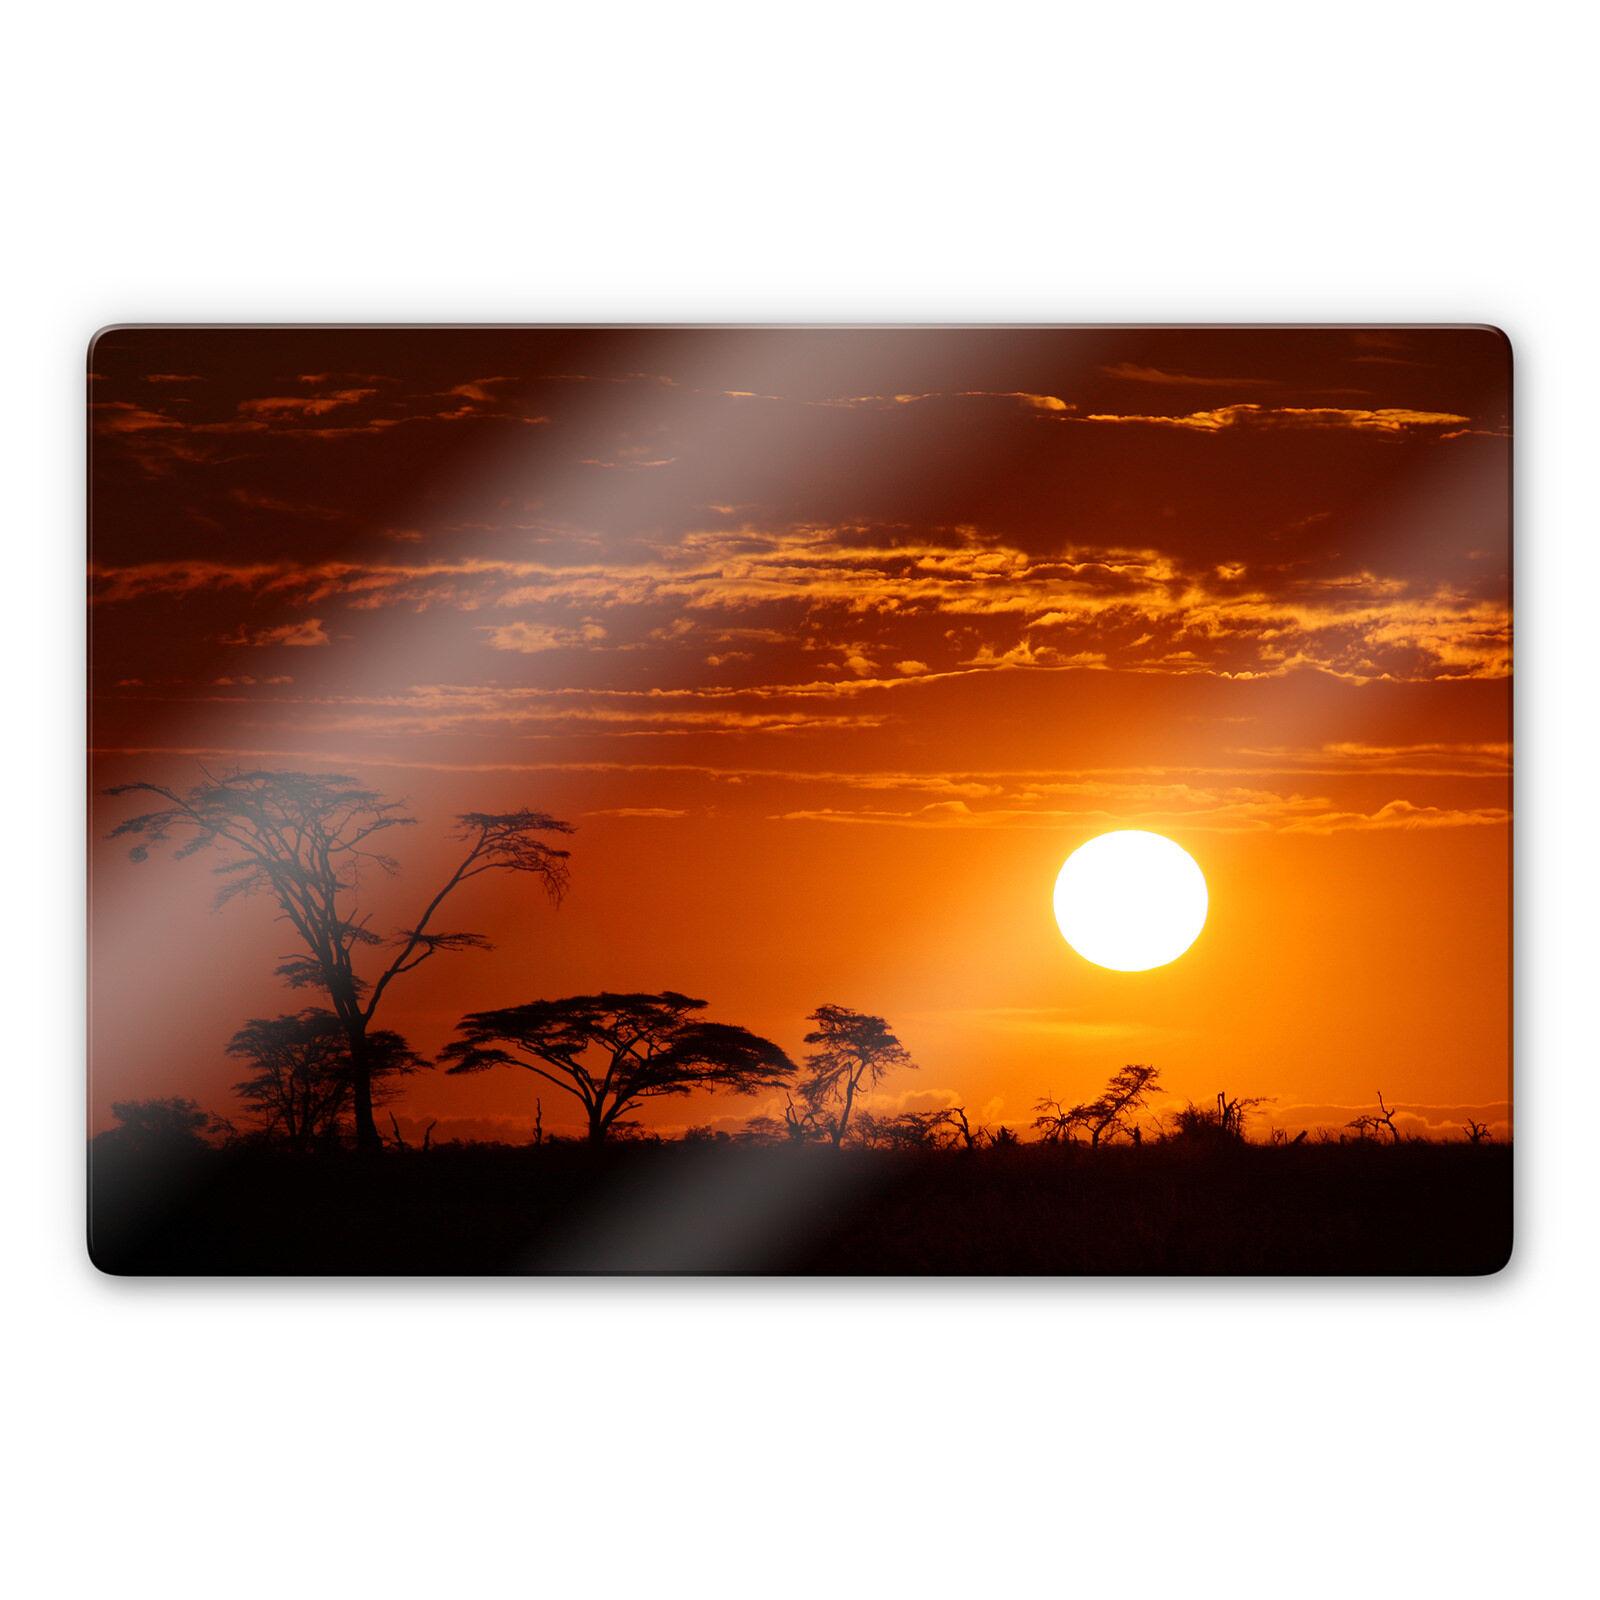 Glasbild Afrikanische Steppe Orange WANDBILD 4mm ESG Sicherheitsglas DEKO